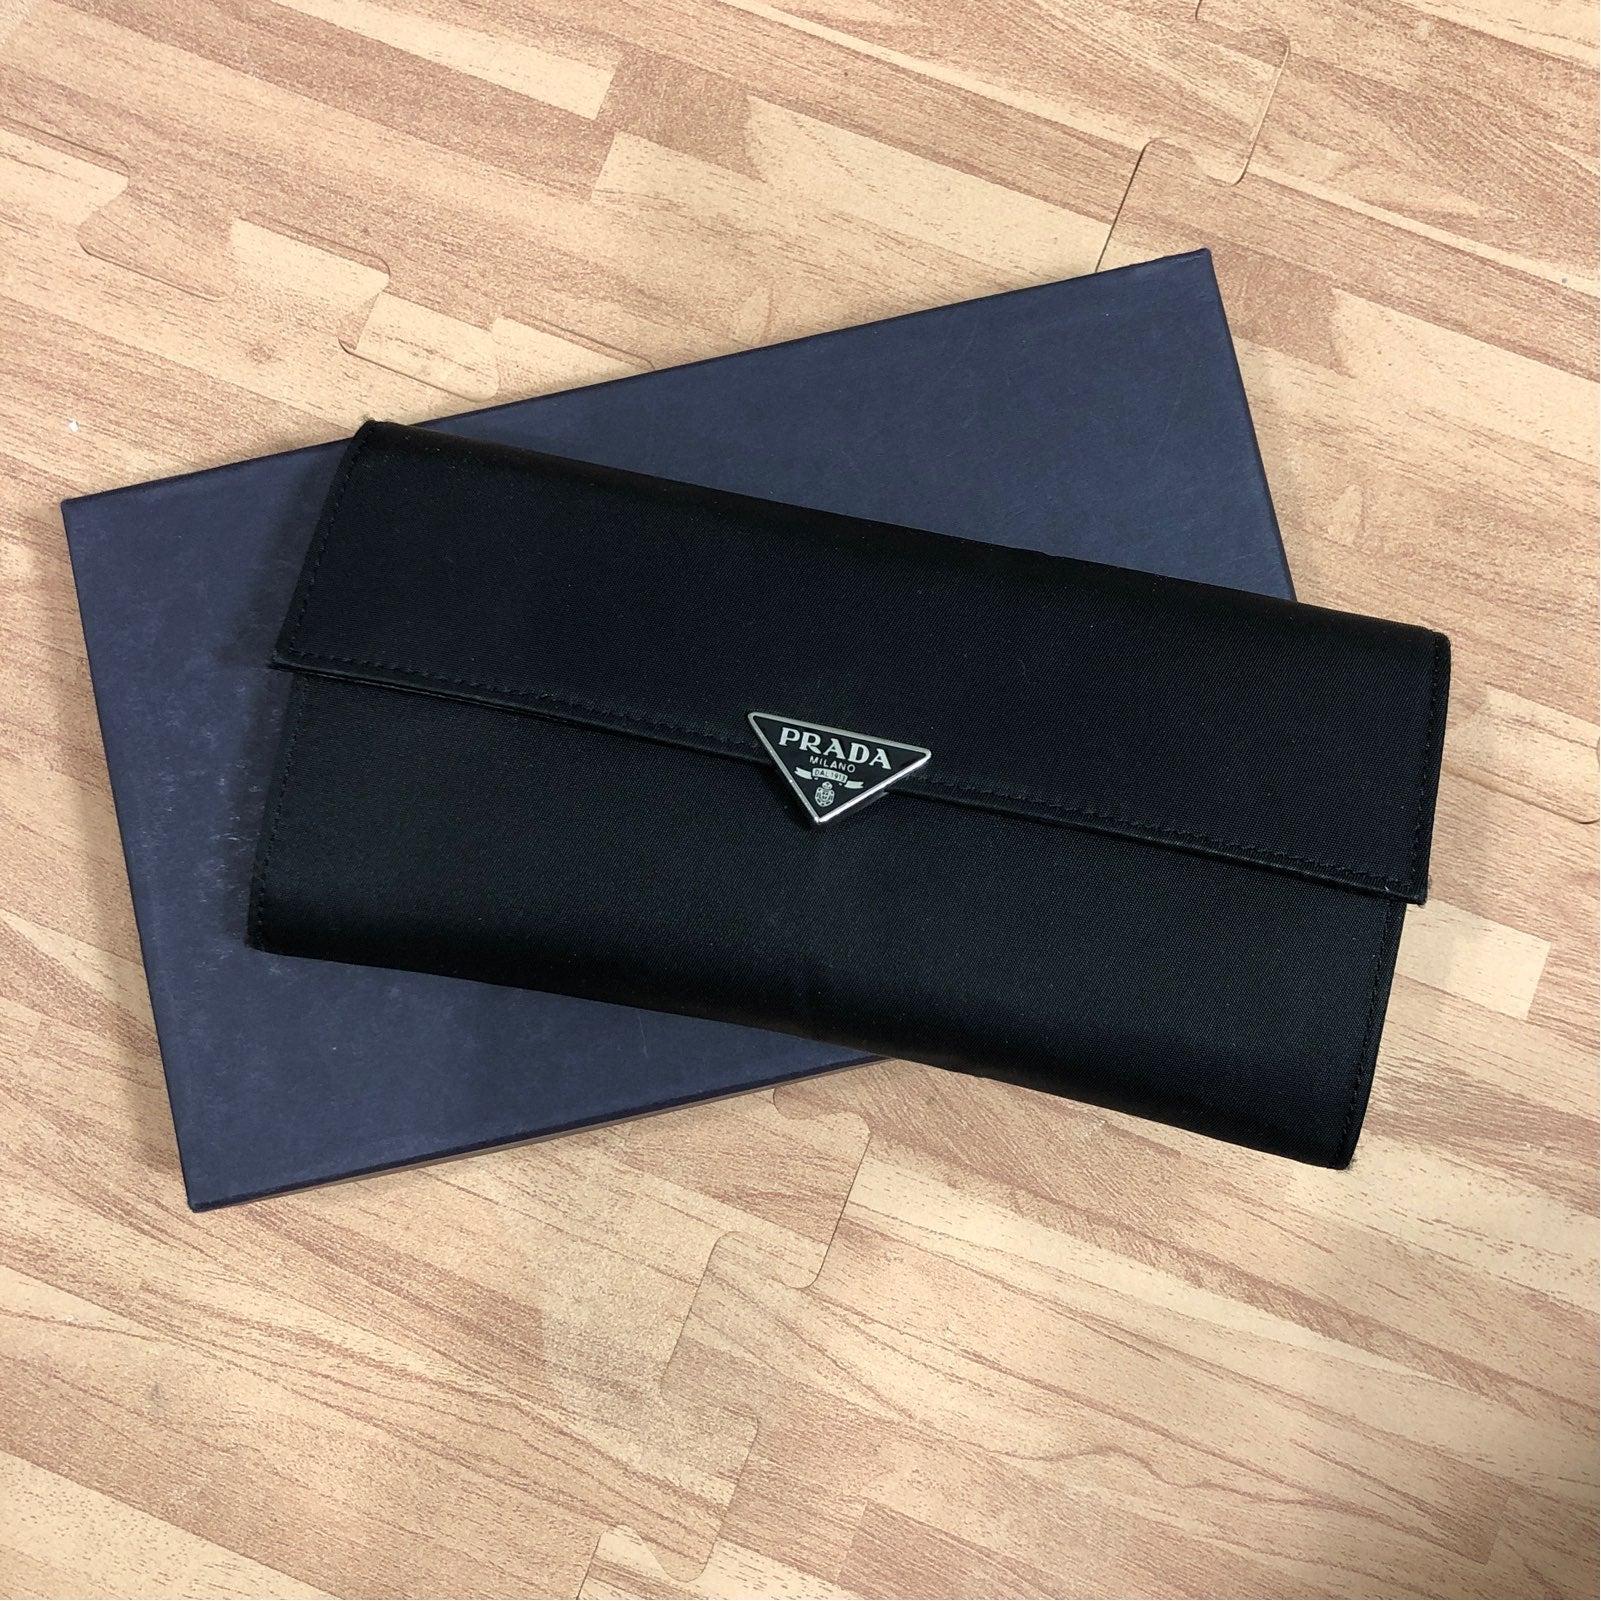 Black Prada Nylon Wallet w/Box & Cards